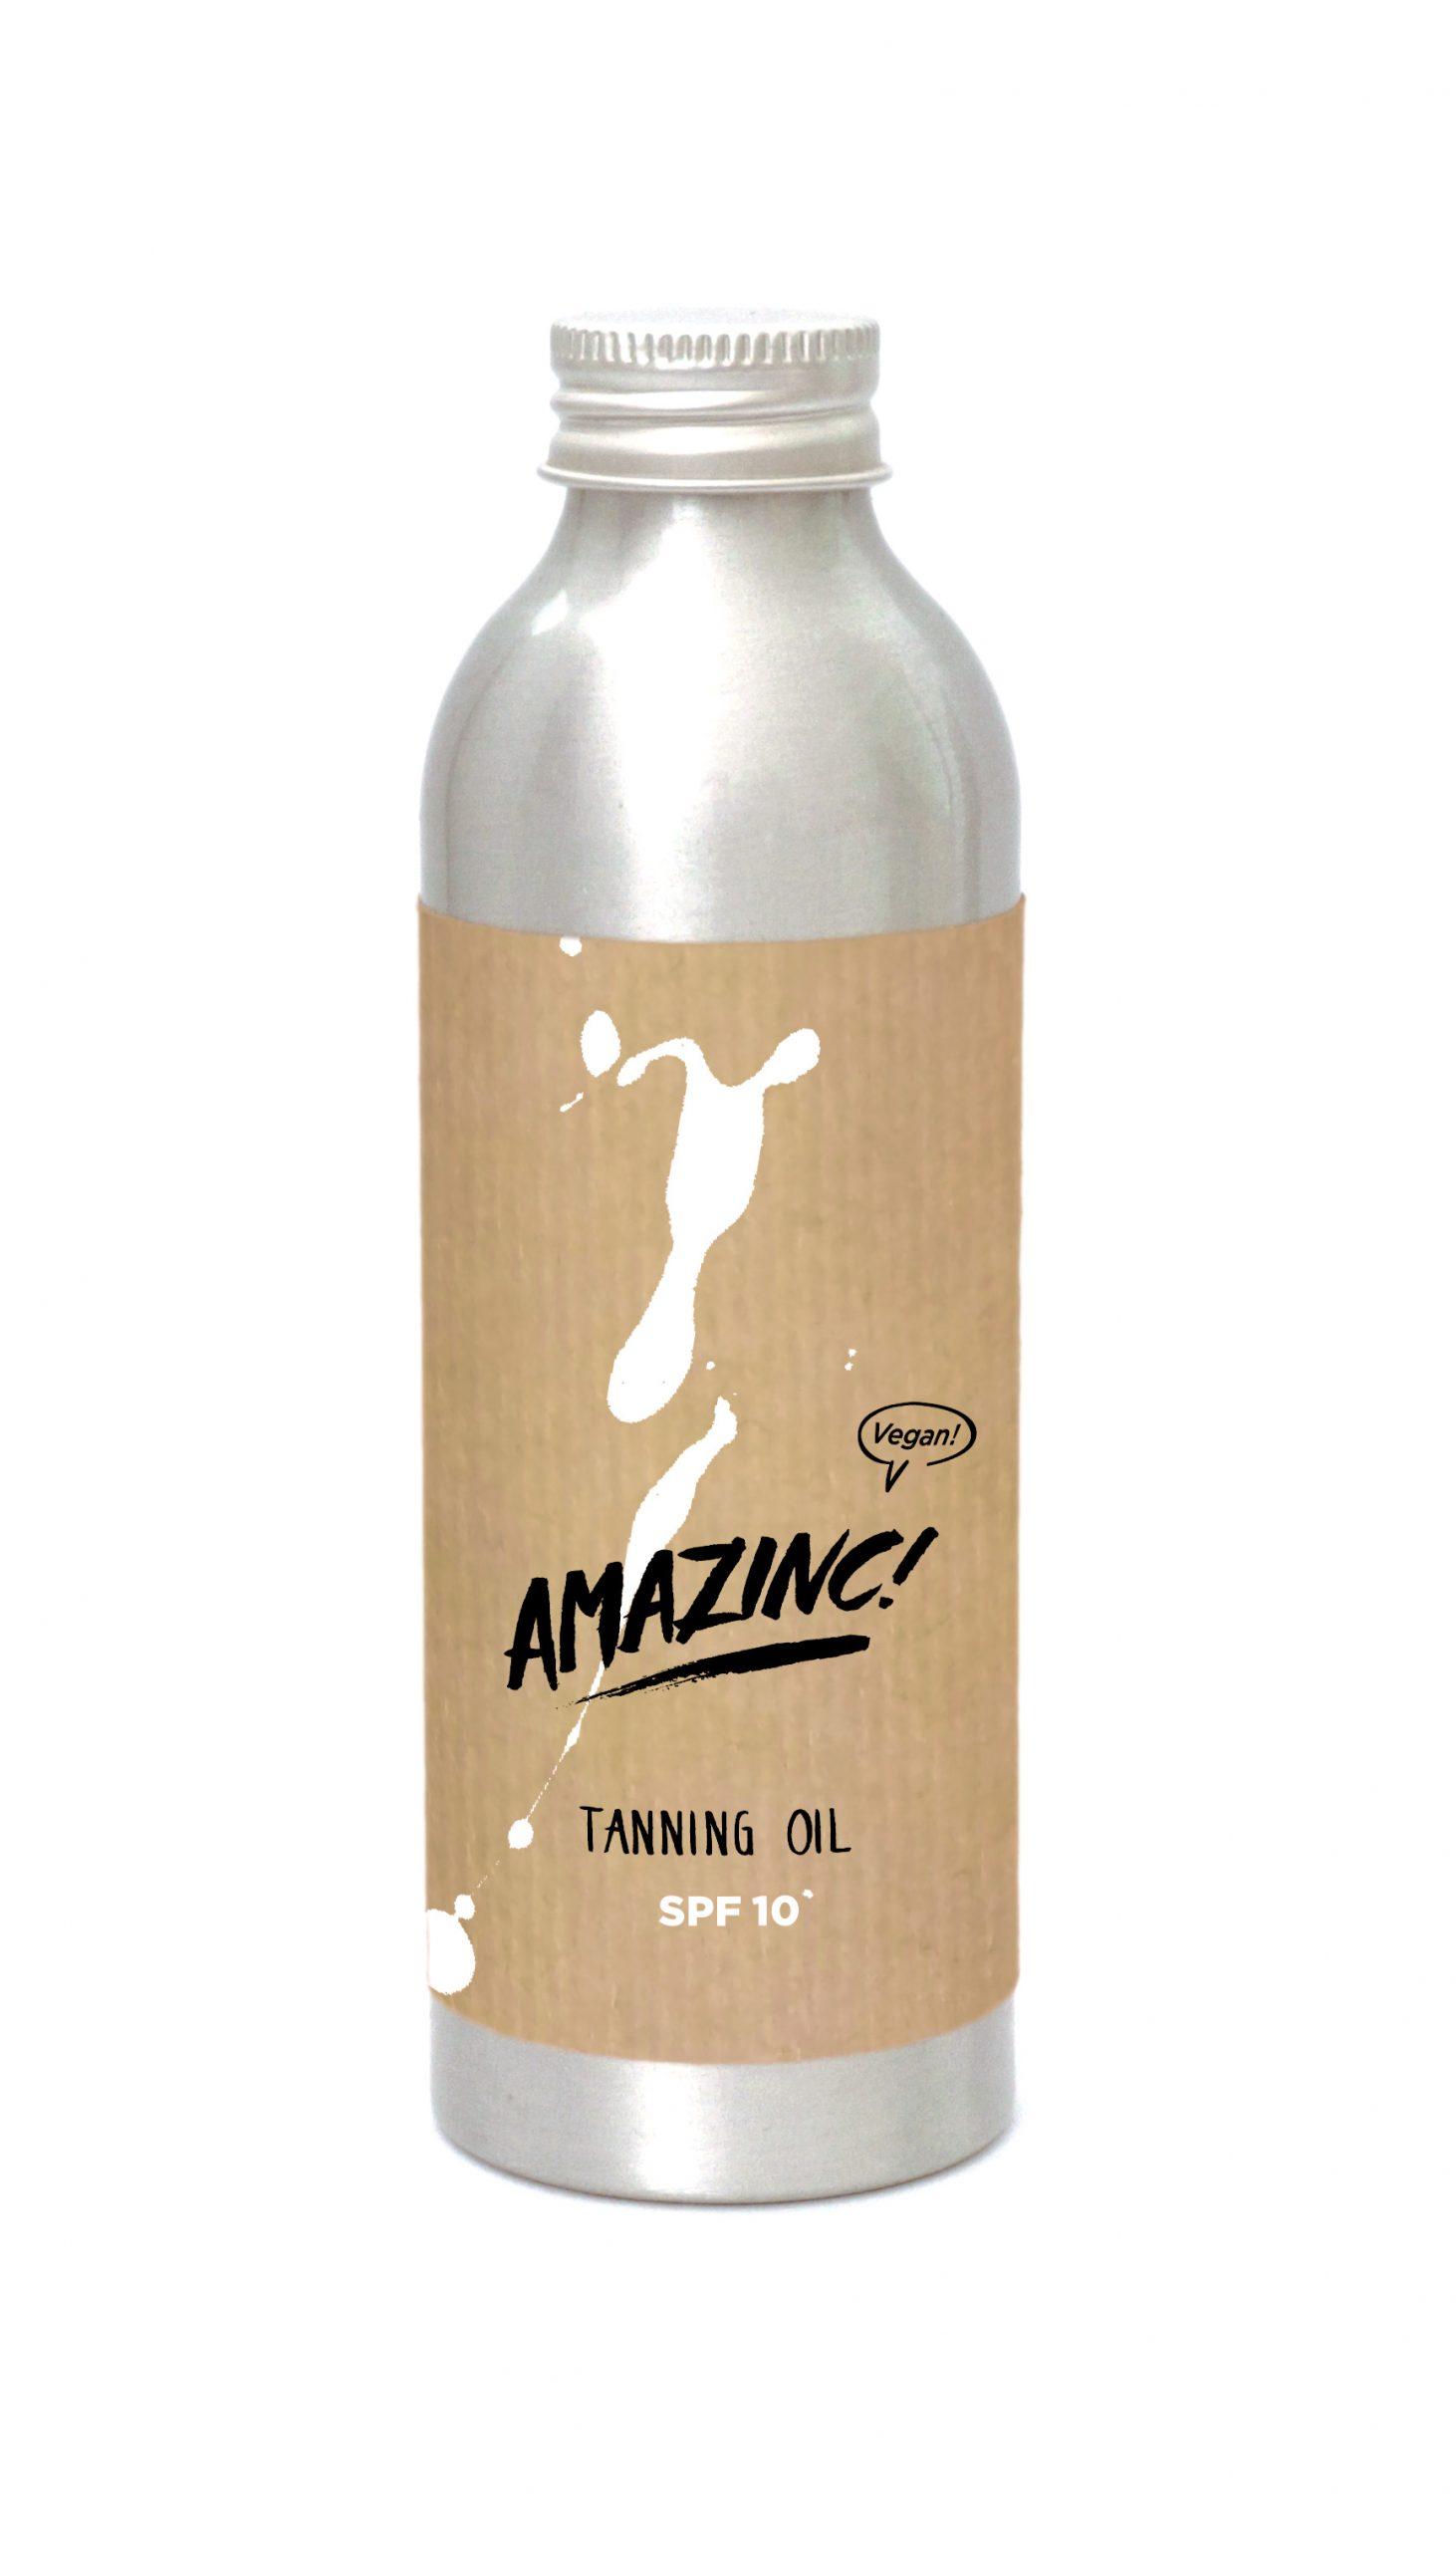 Amazinc Tanning Oil - Large - SPF 10+